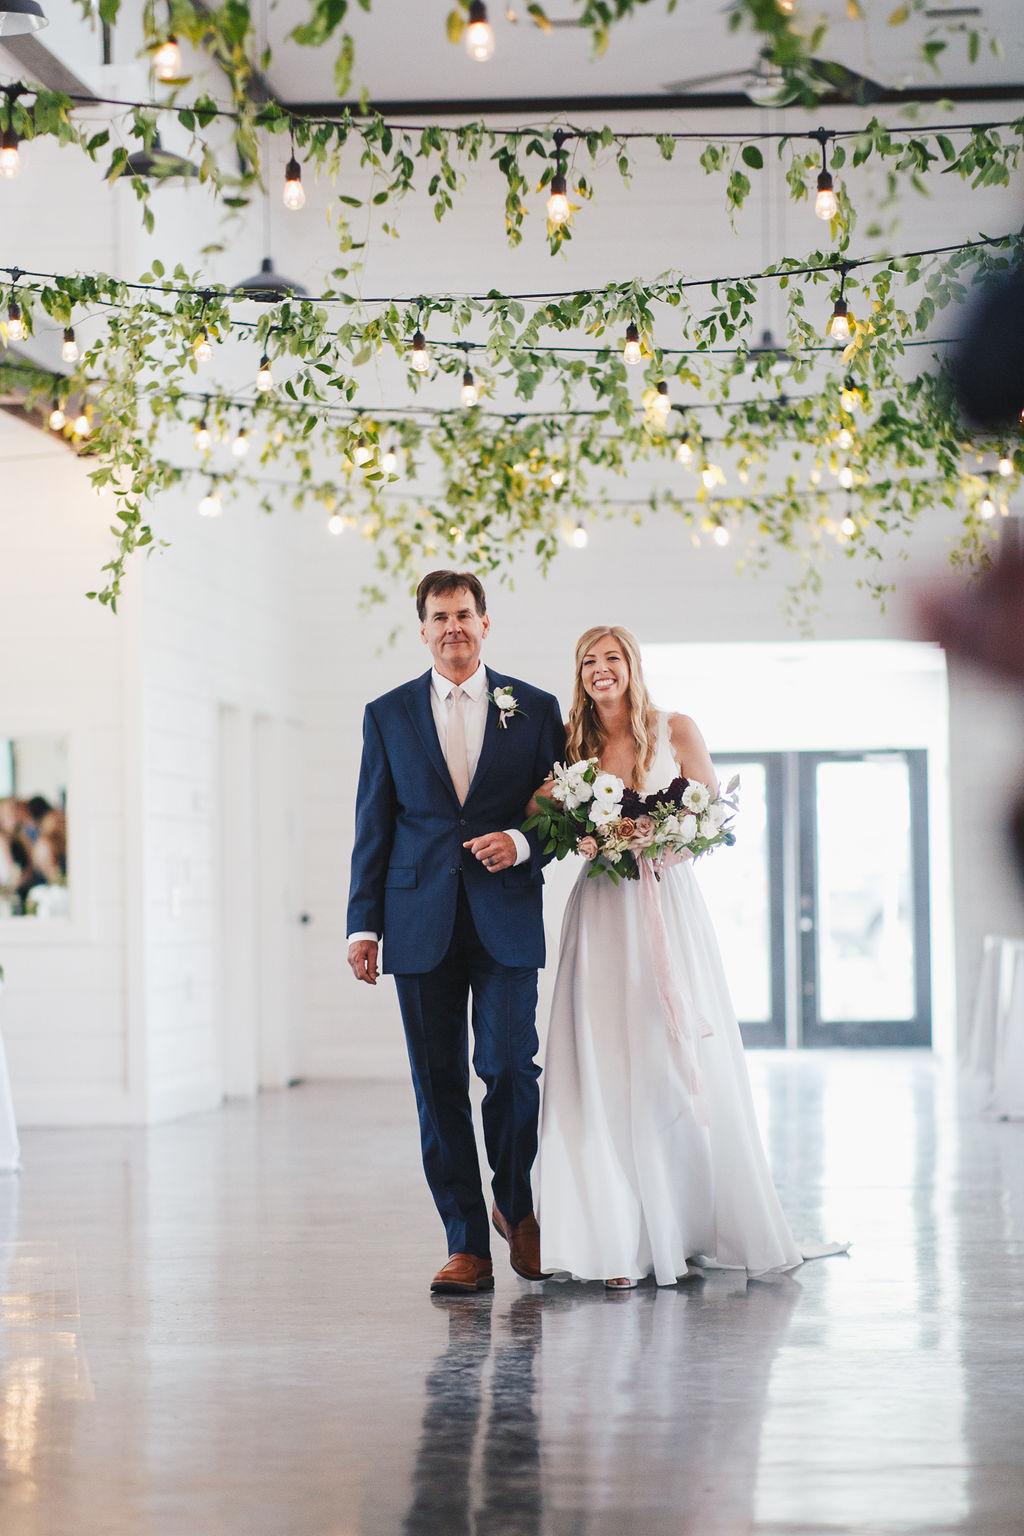 Bixby White Barn Tulsa Wedding 55.jpg